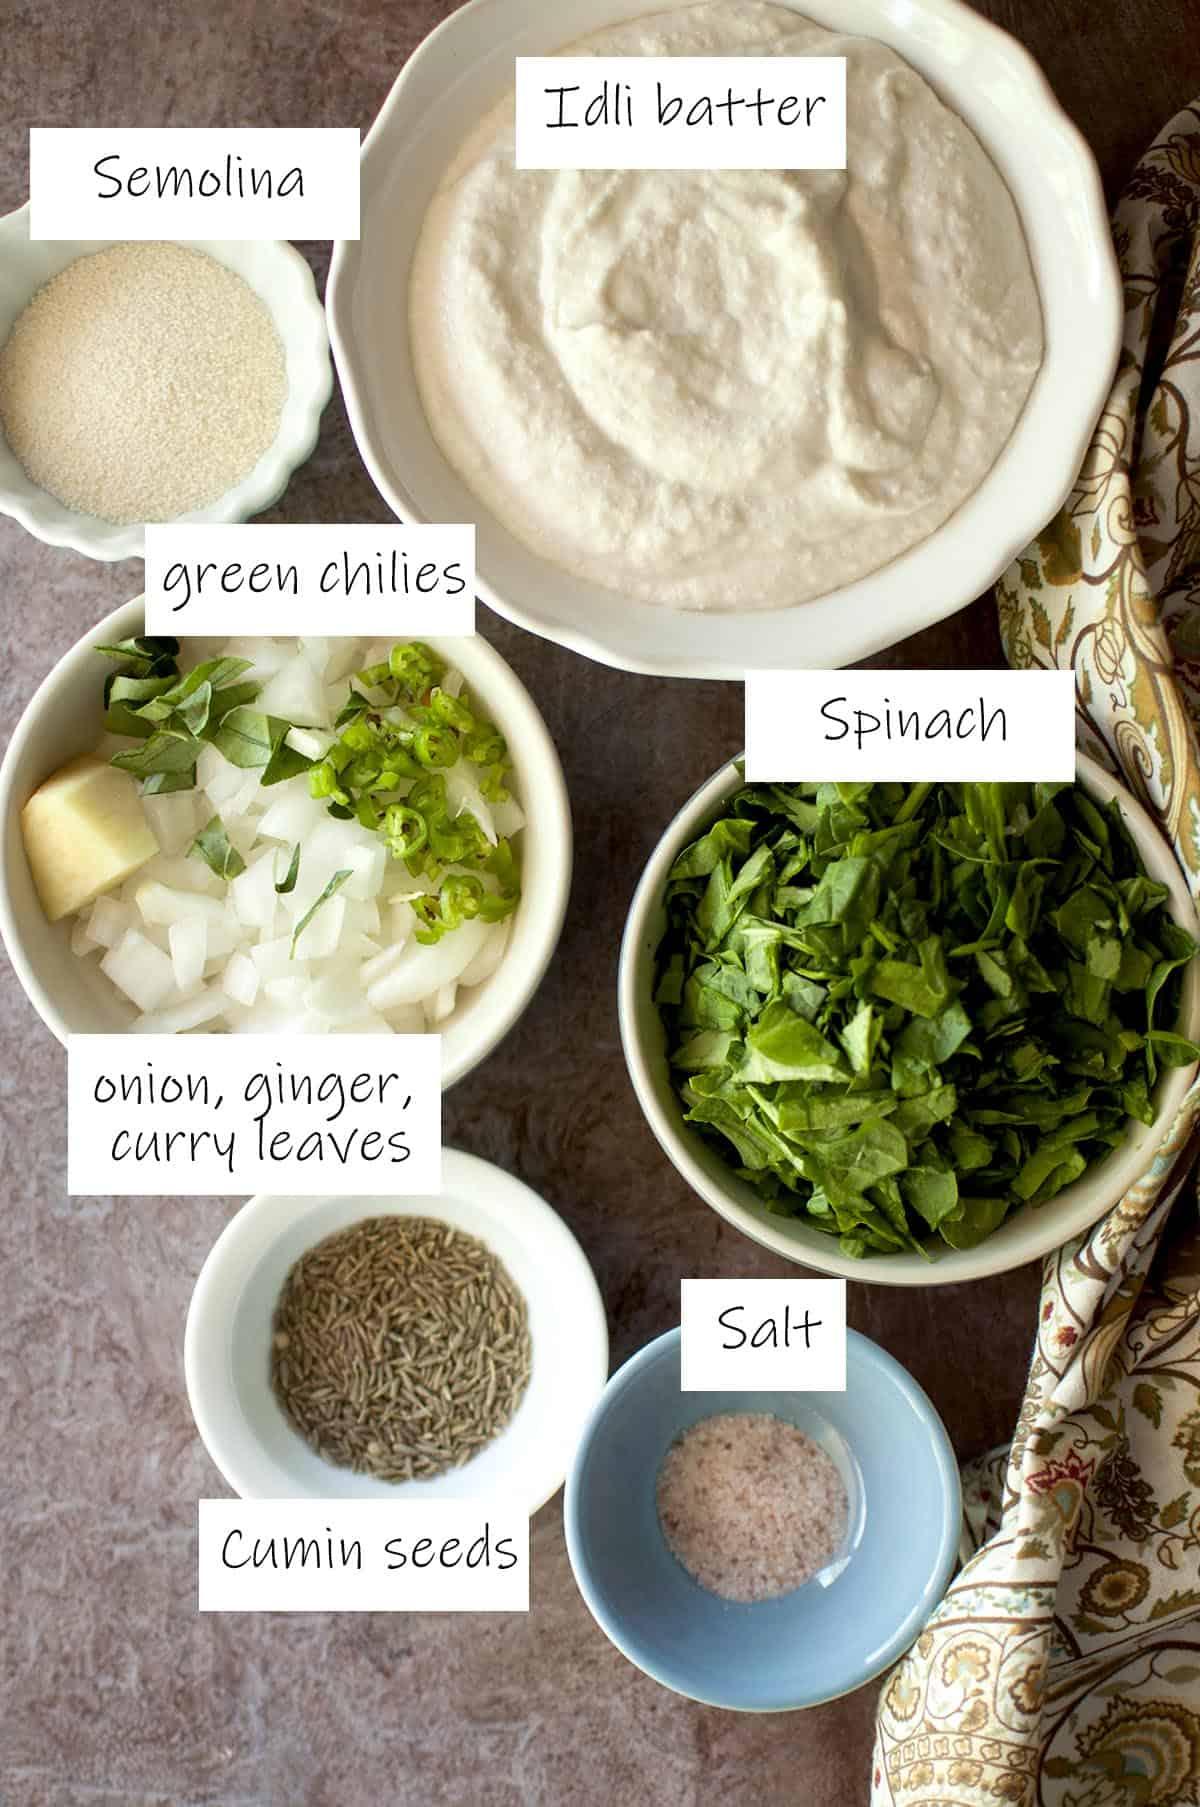 Ingredients needed - details in recipe card